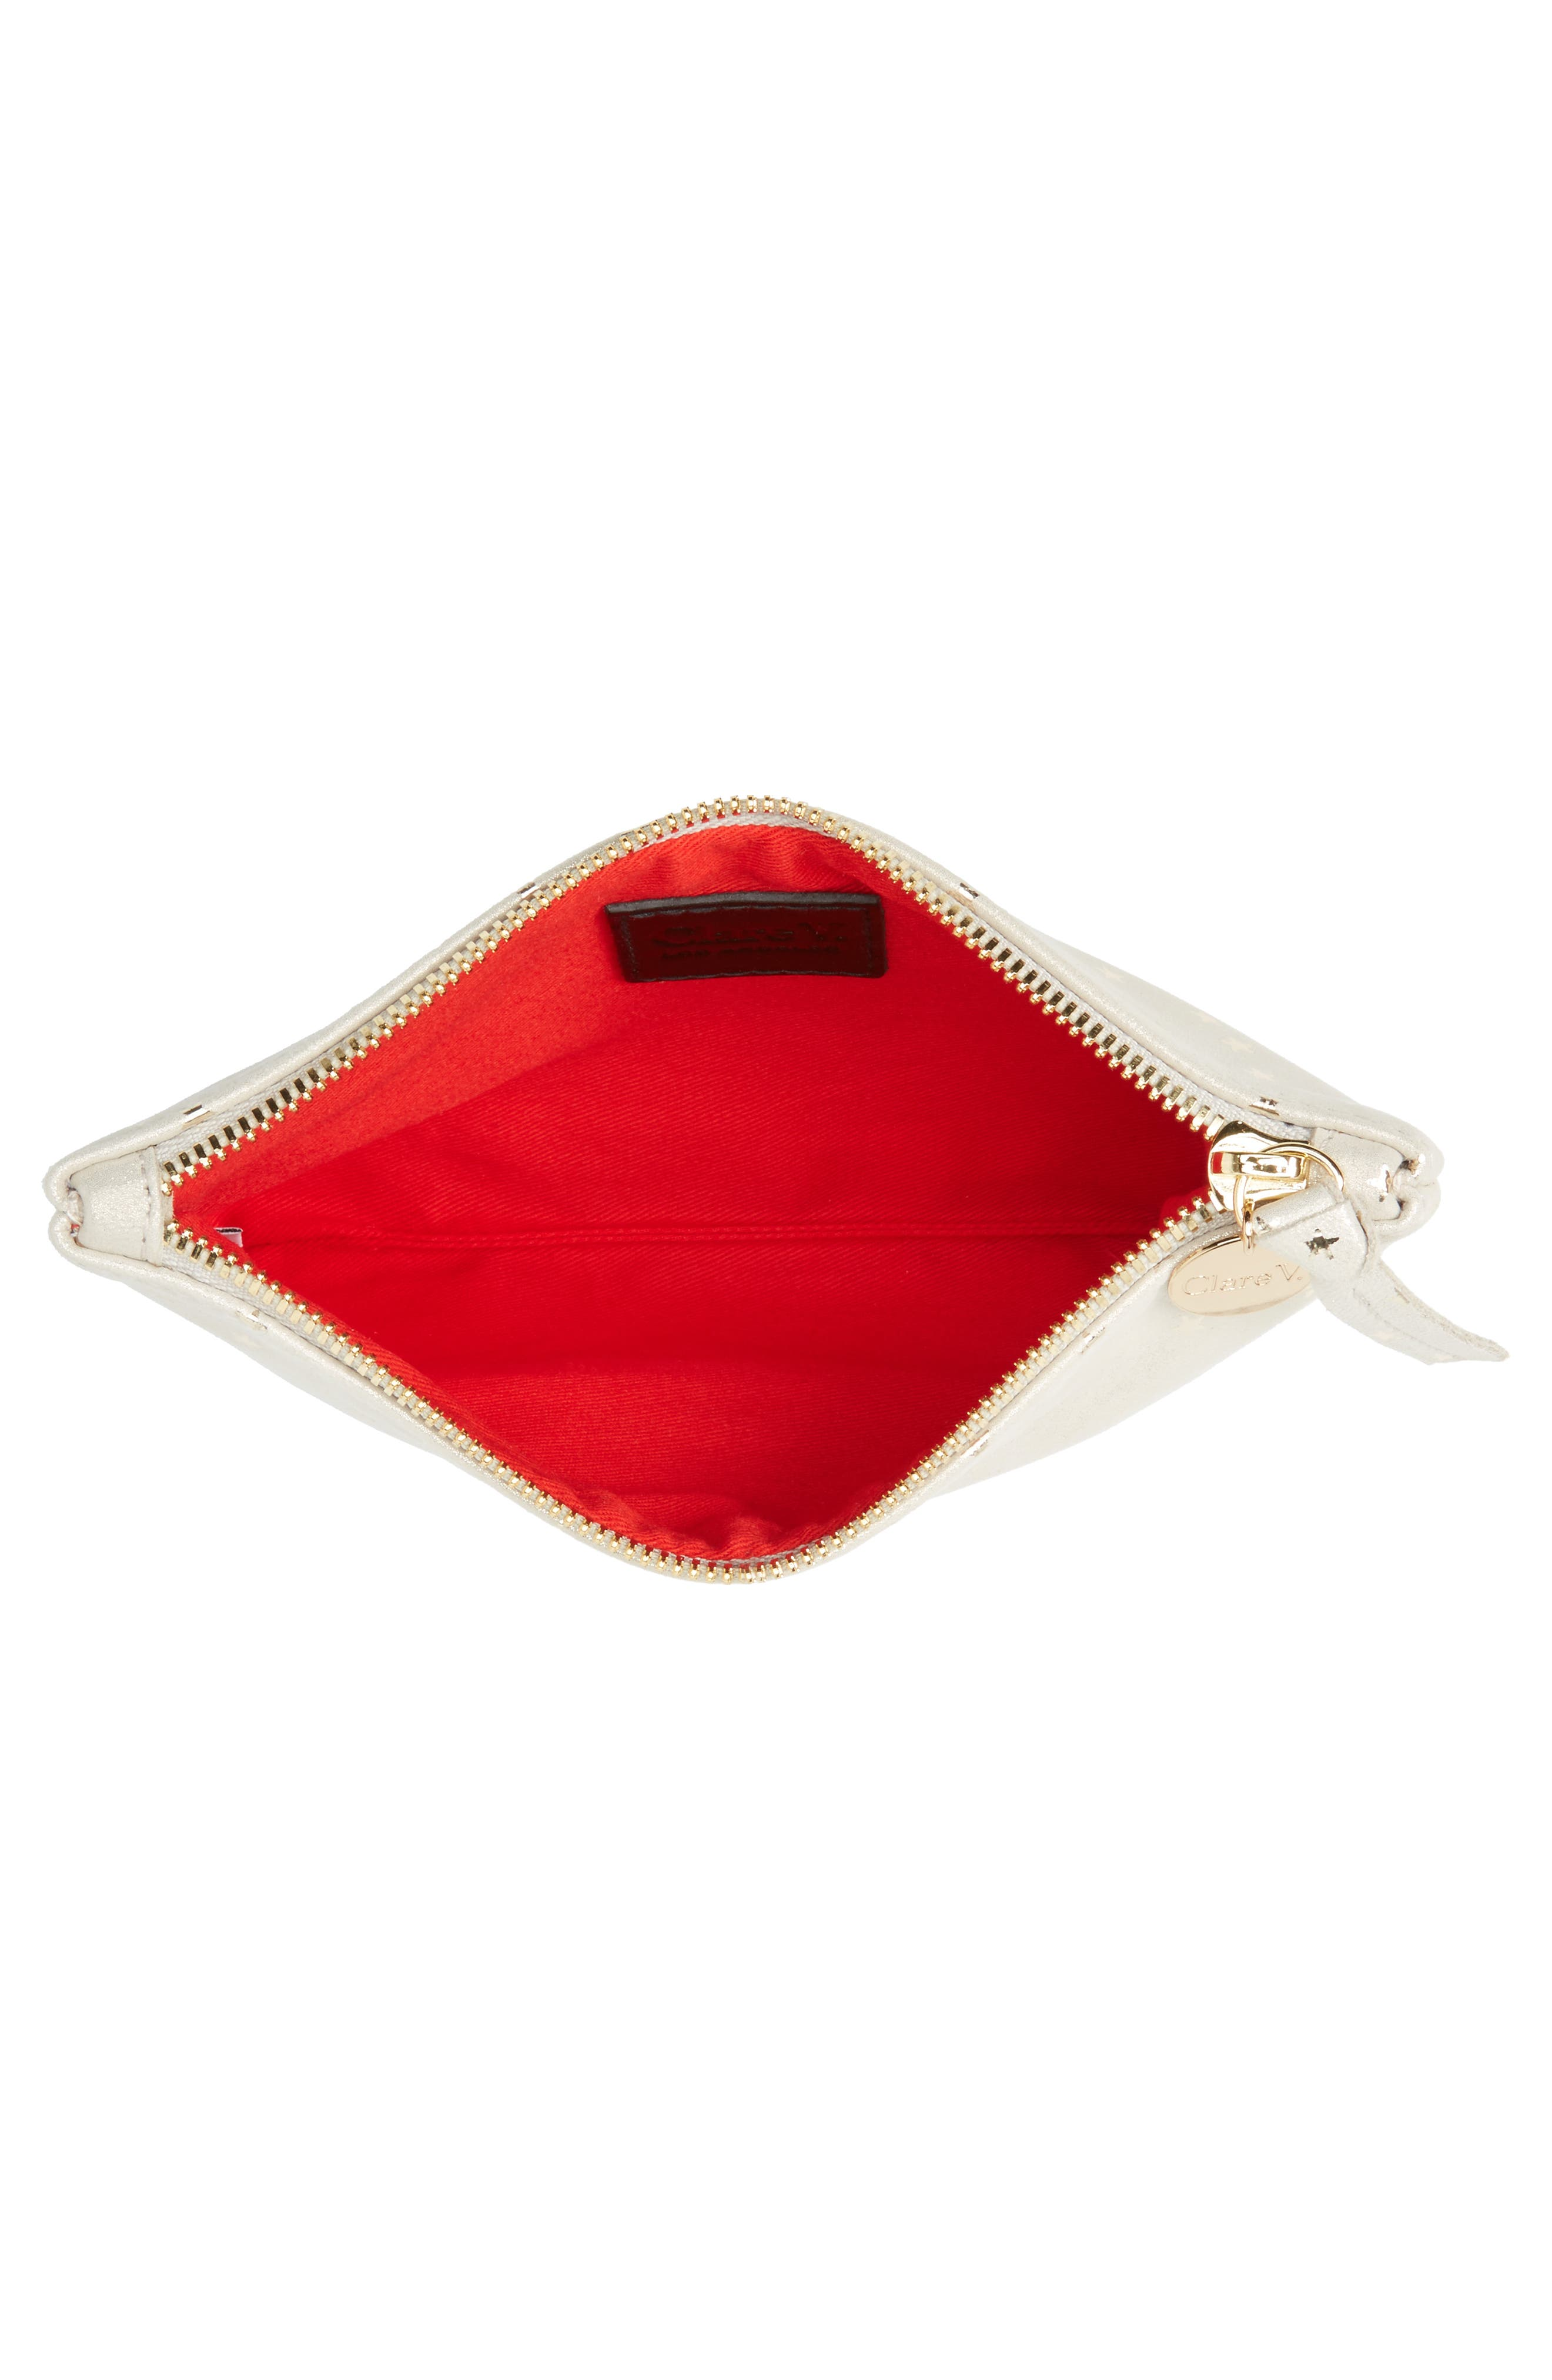 Supreme Star Shimmer Suede Wallet Clutch,                             Alternate thumbnail 4, color,                             900